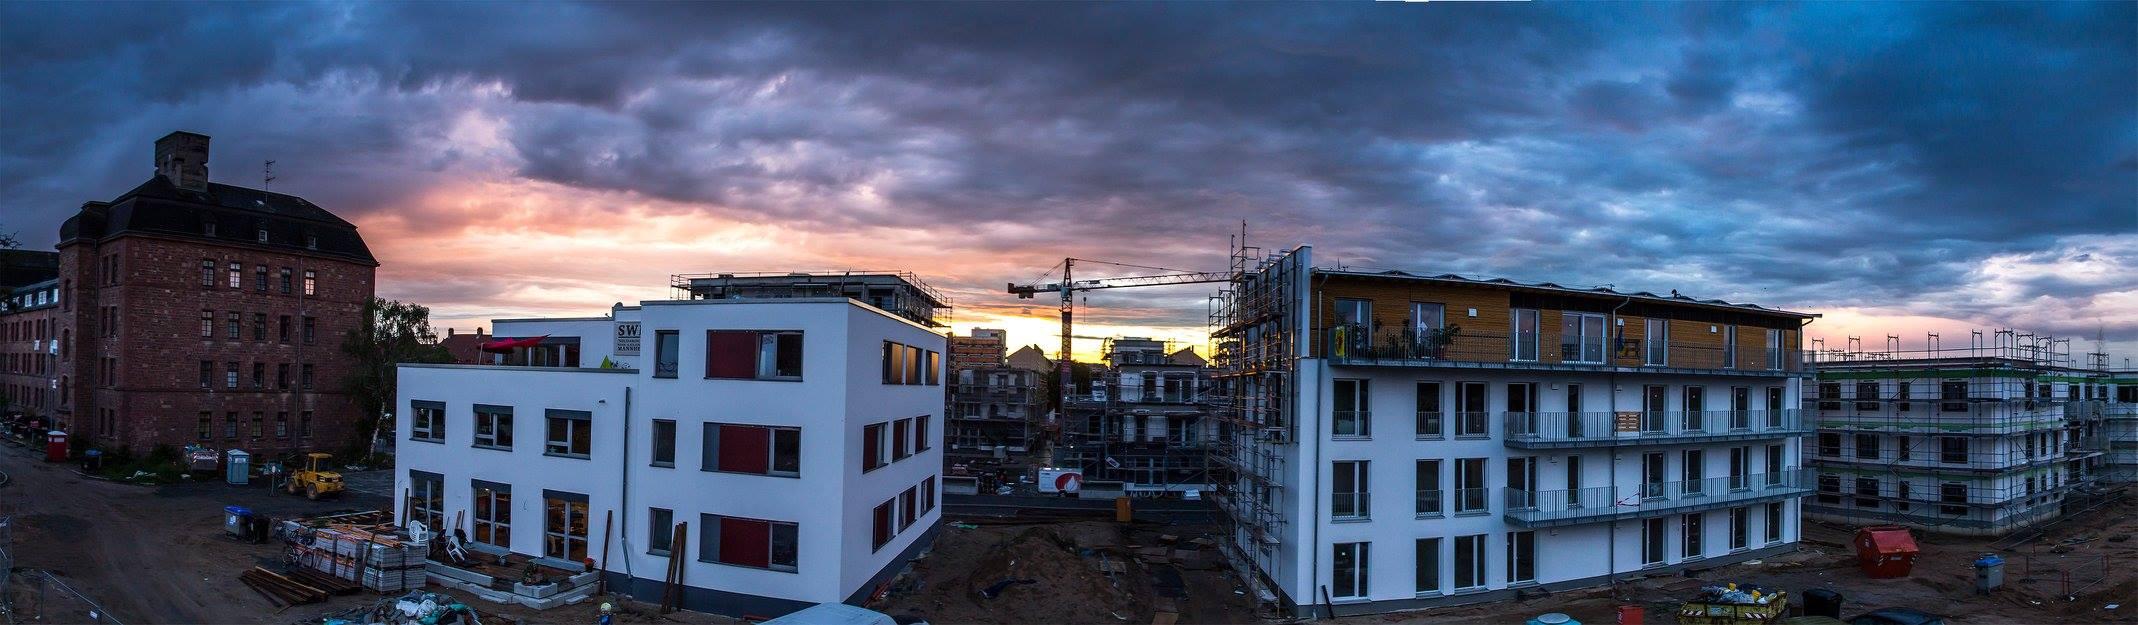 Fritz-Salm-Straße-Sonnenuntergang